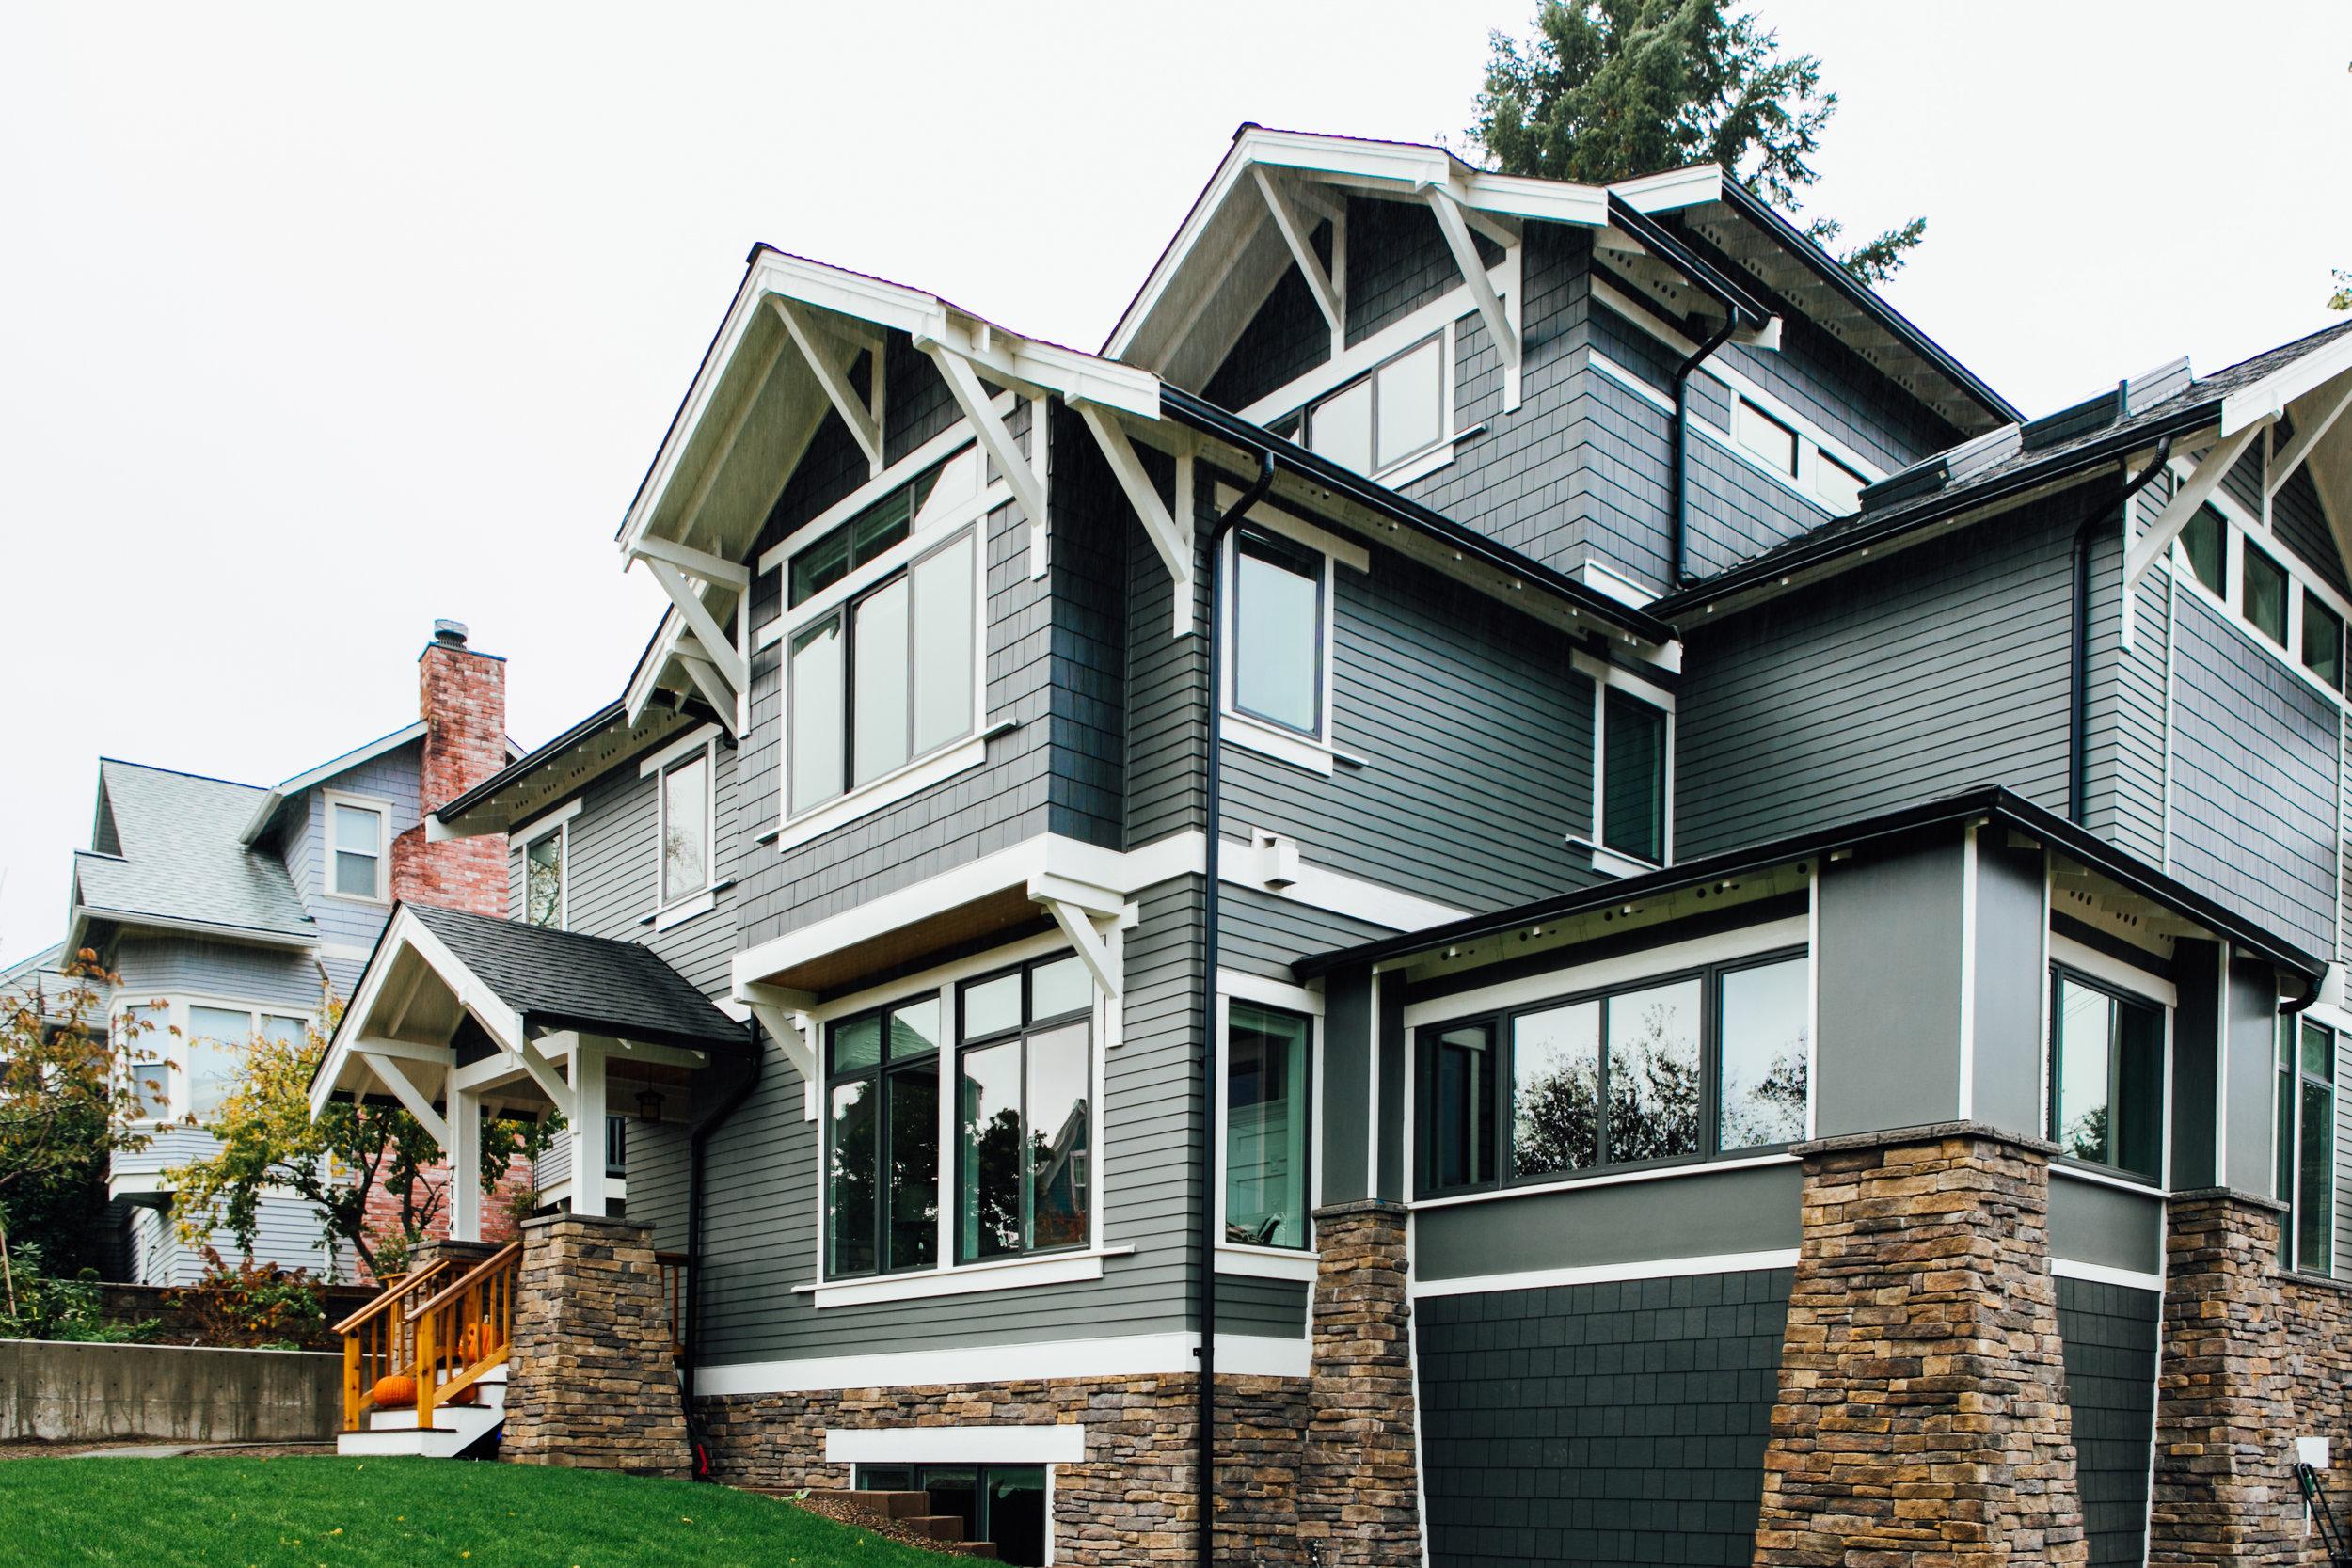 mandy callaway interiors-greenlake house-00002.jpg